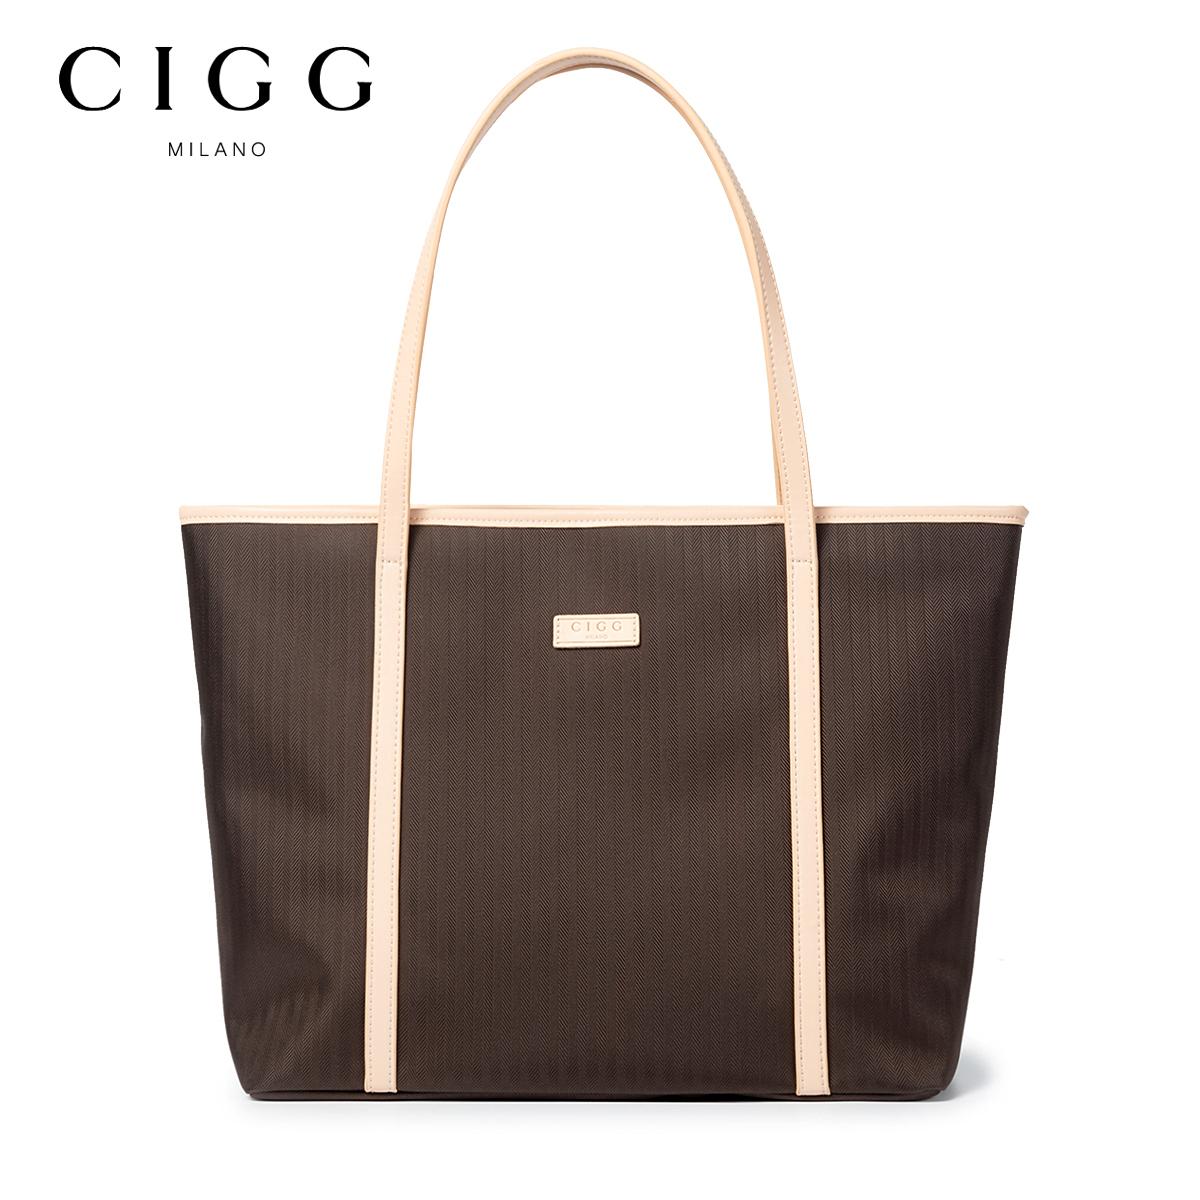 CIGG女包包牛津布包新款2019托特帆布包袋尼龙大容量手提单肩包女